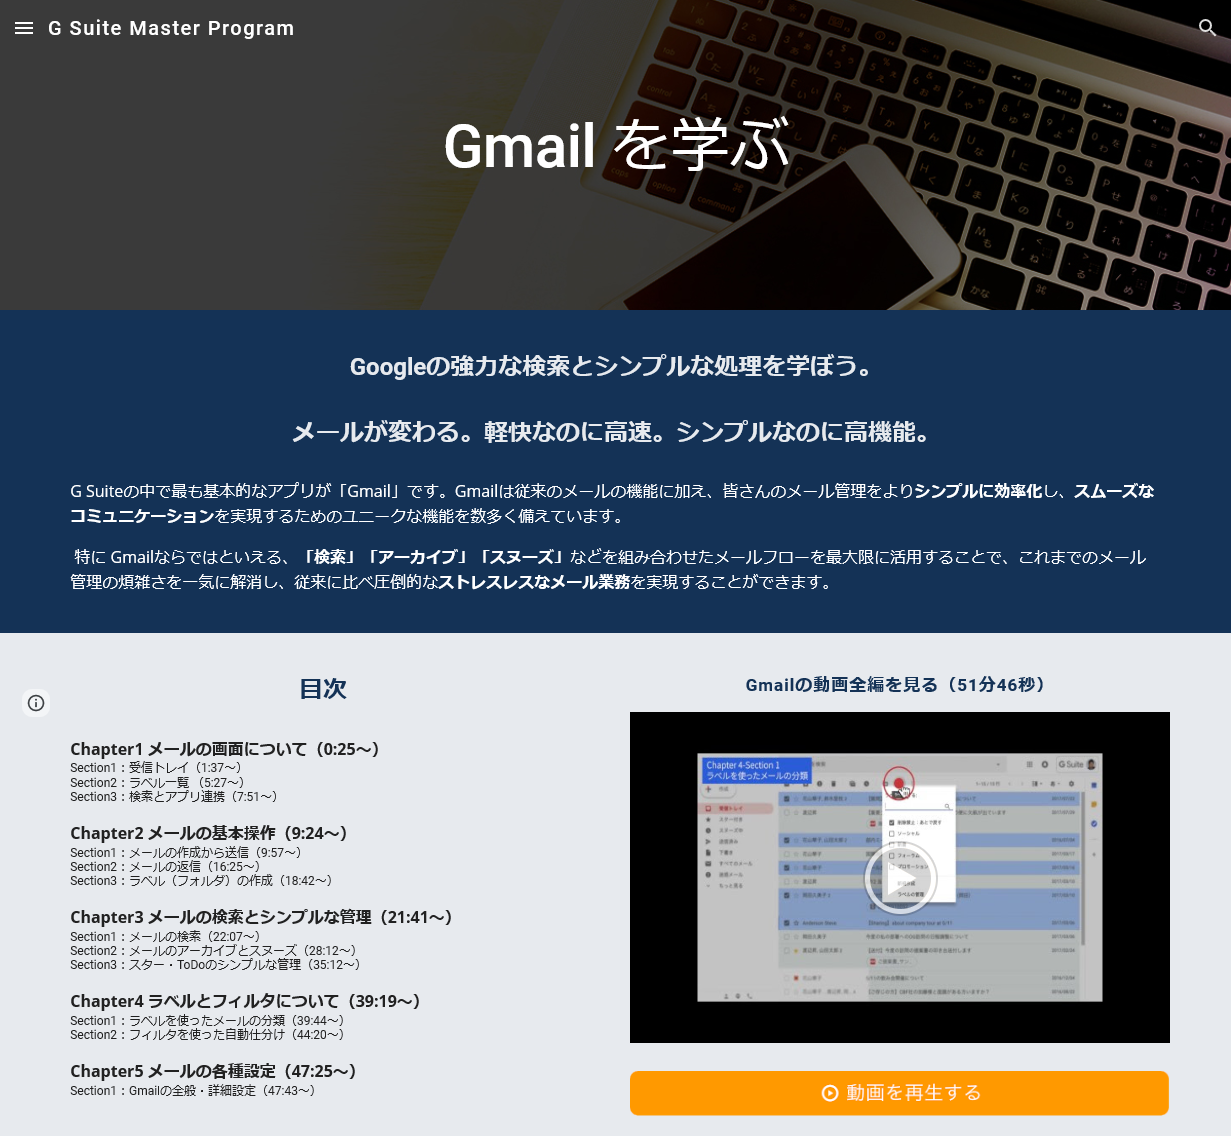 「Gmail」のレクチャー動画ページ